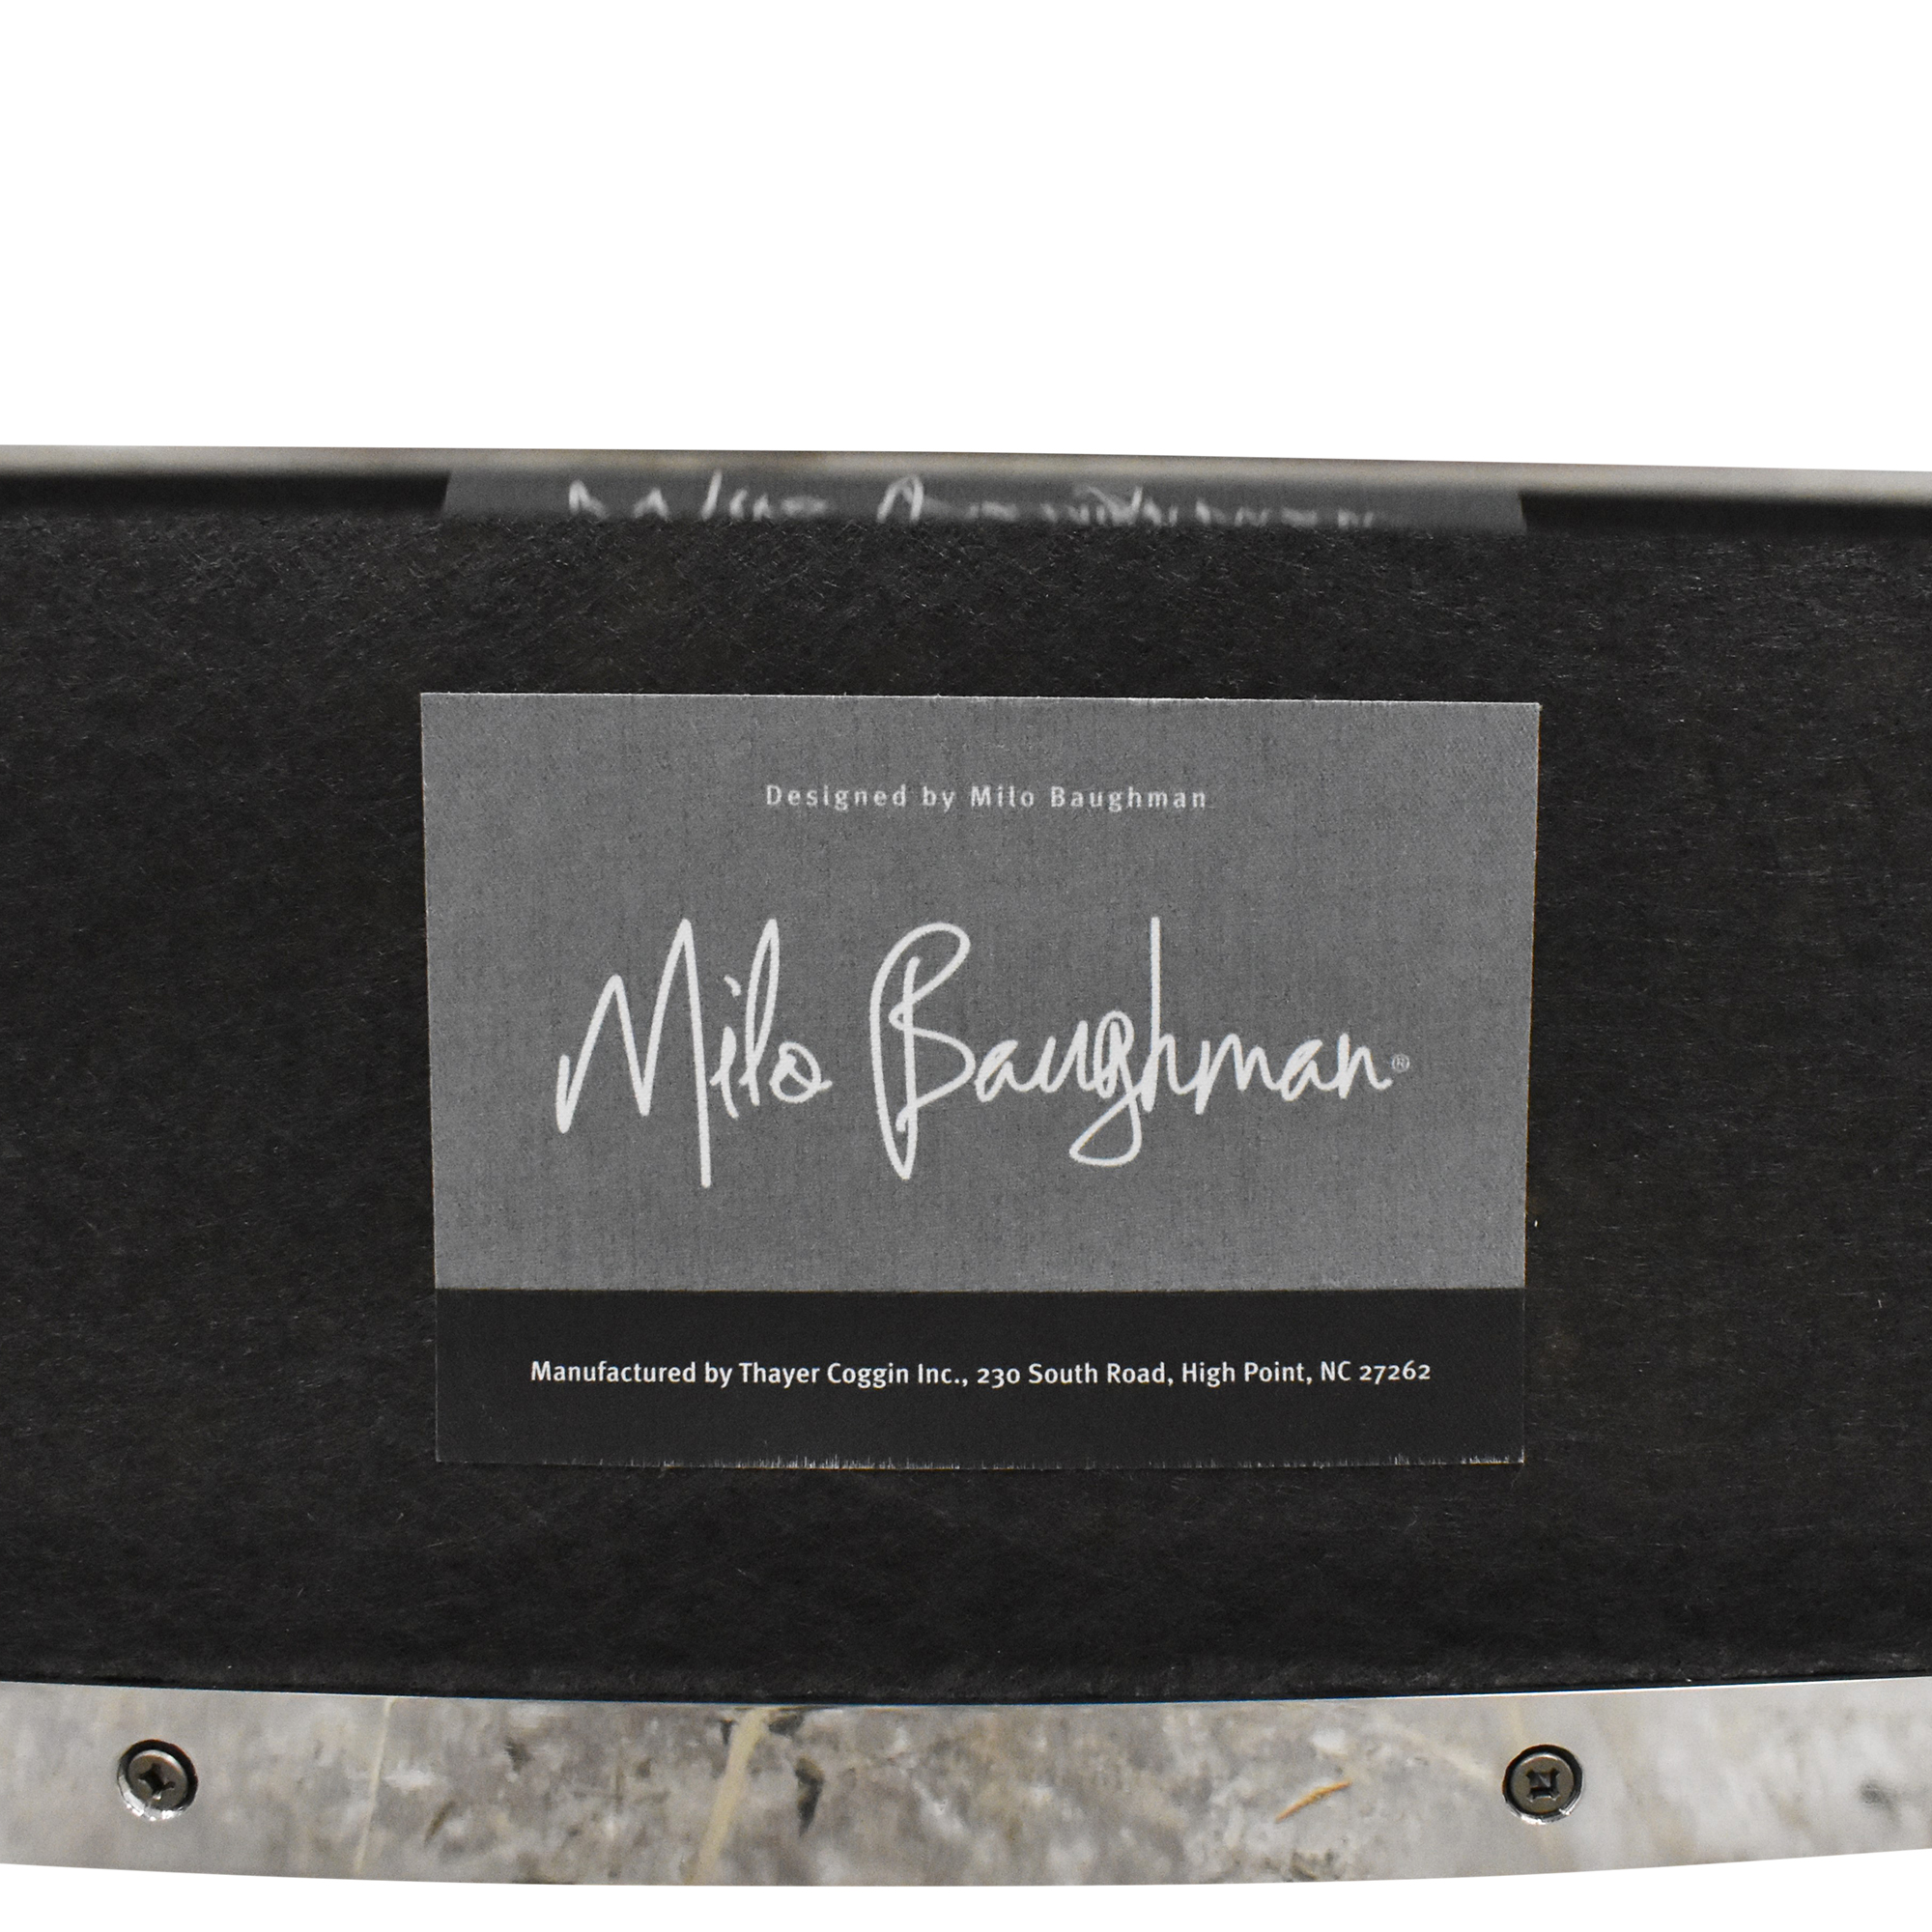 Restoration Hardware Restoration Hardware Milo Baughman Model #3418 Chair by Thayer Coggin pa